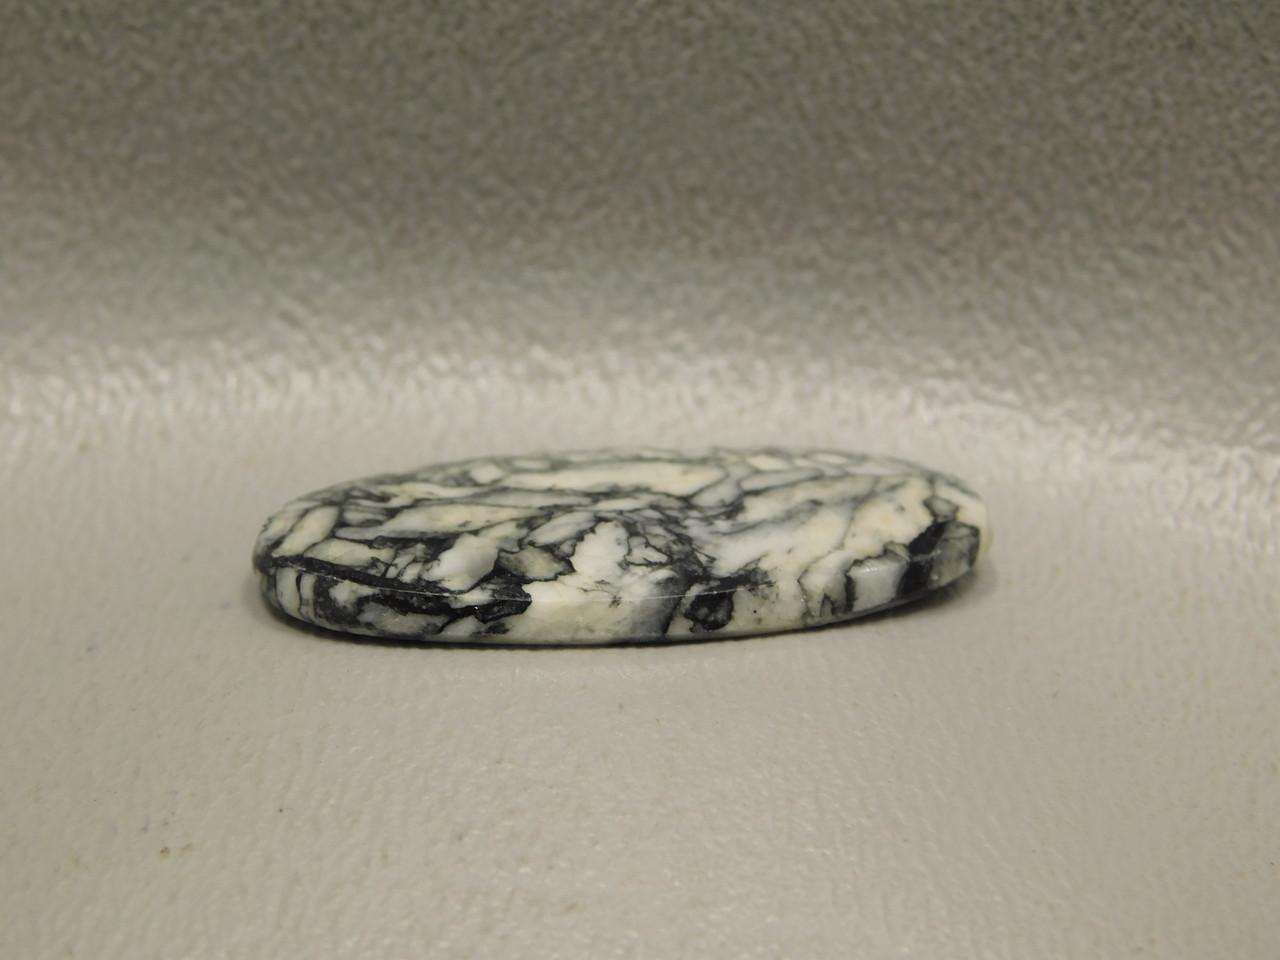 Pinolith or Pinolite Cabochon Jewelry Making Supplies #13